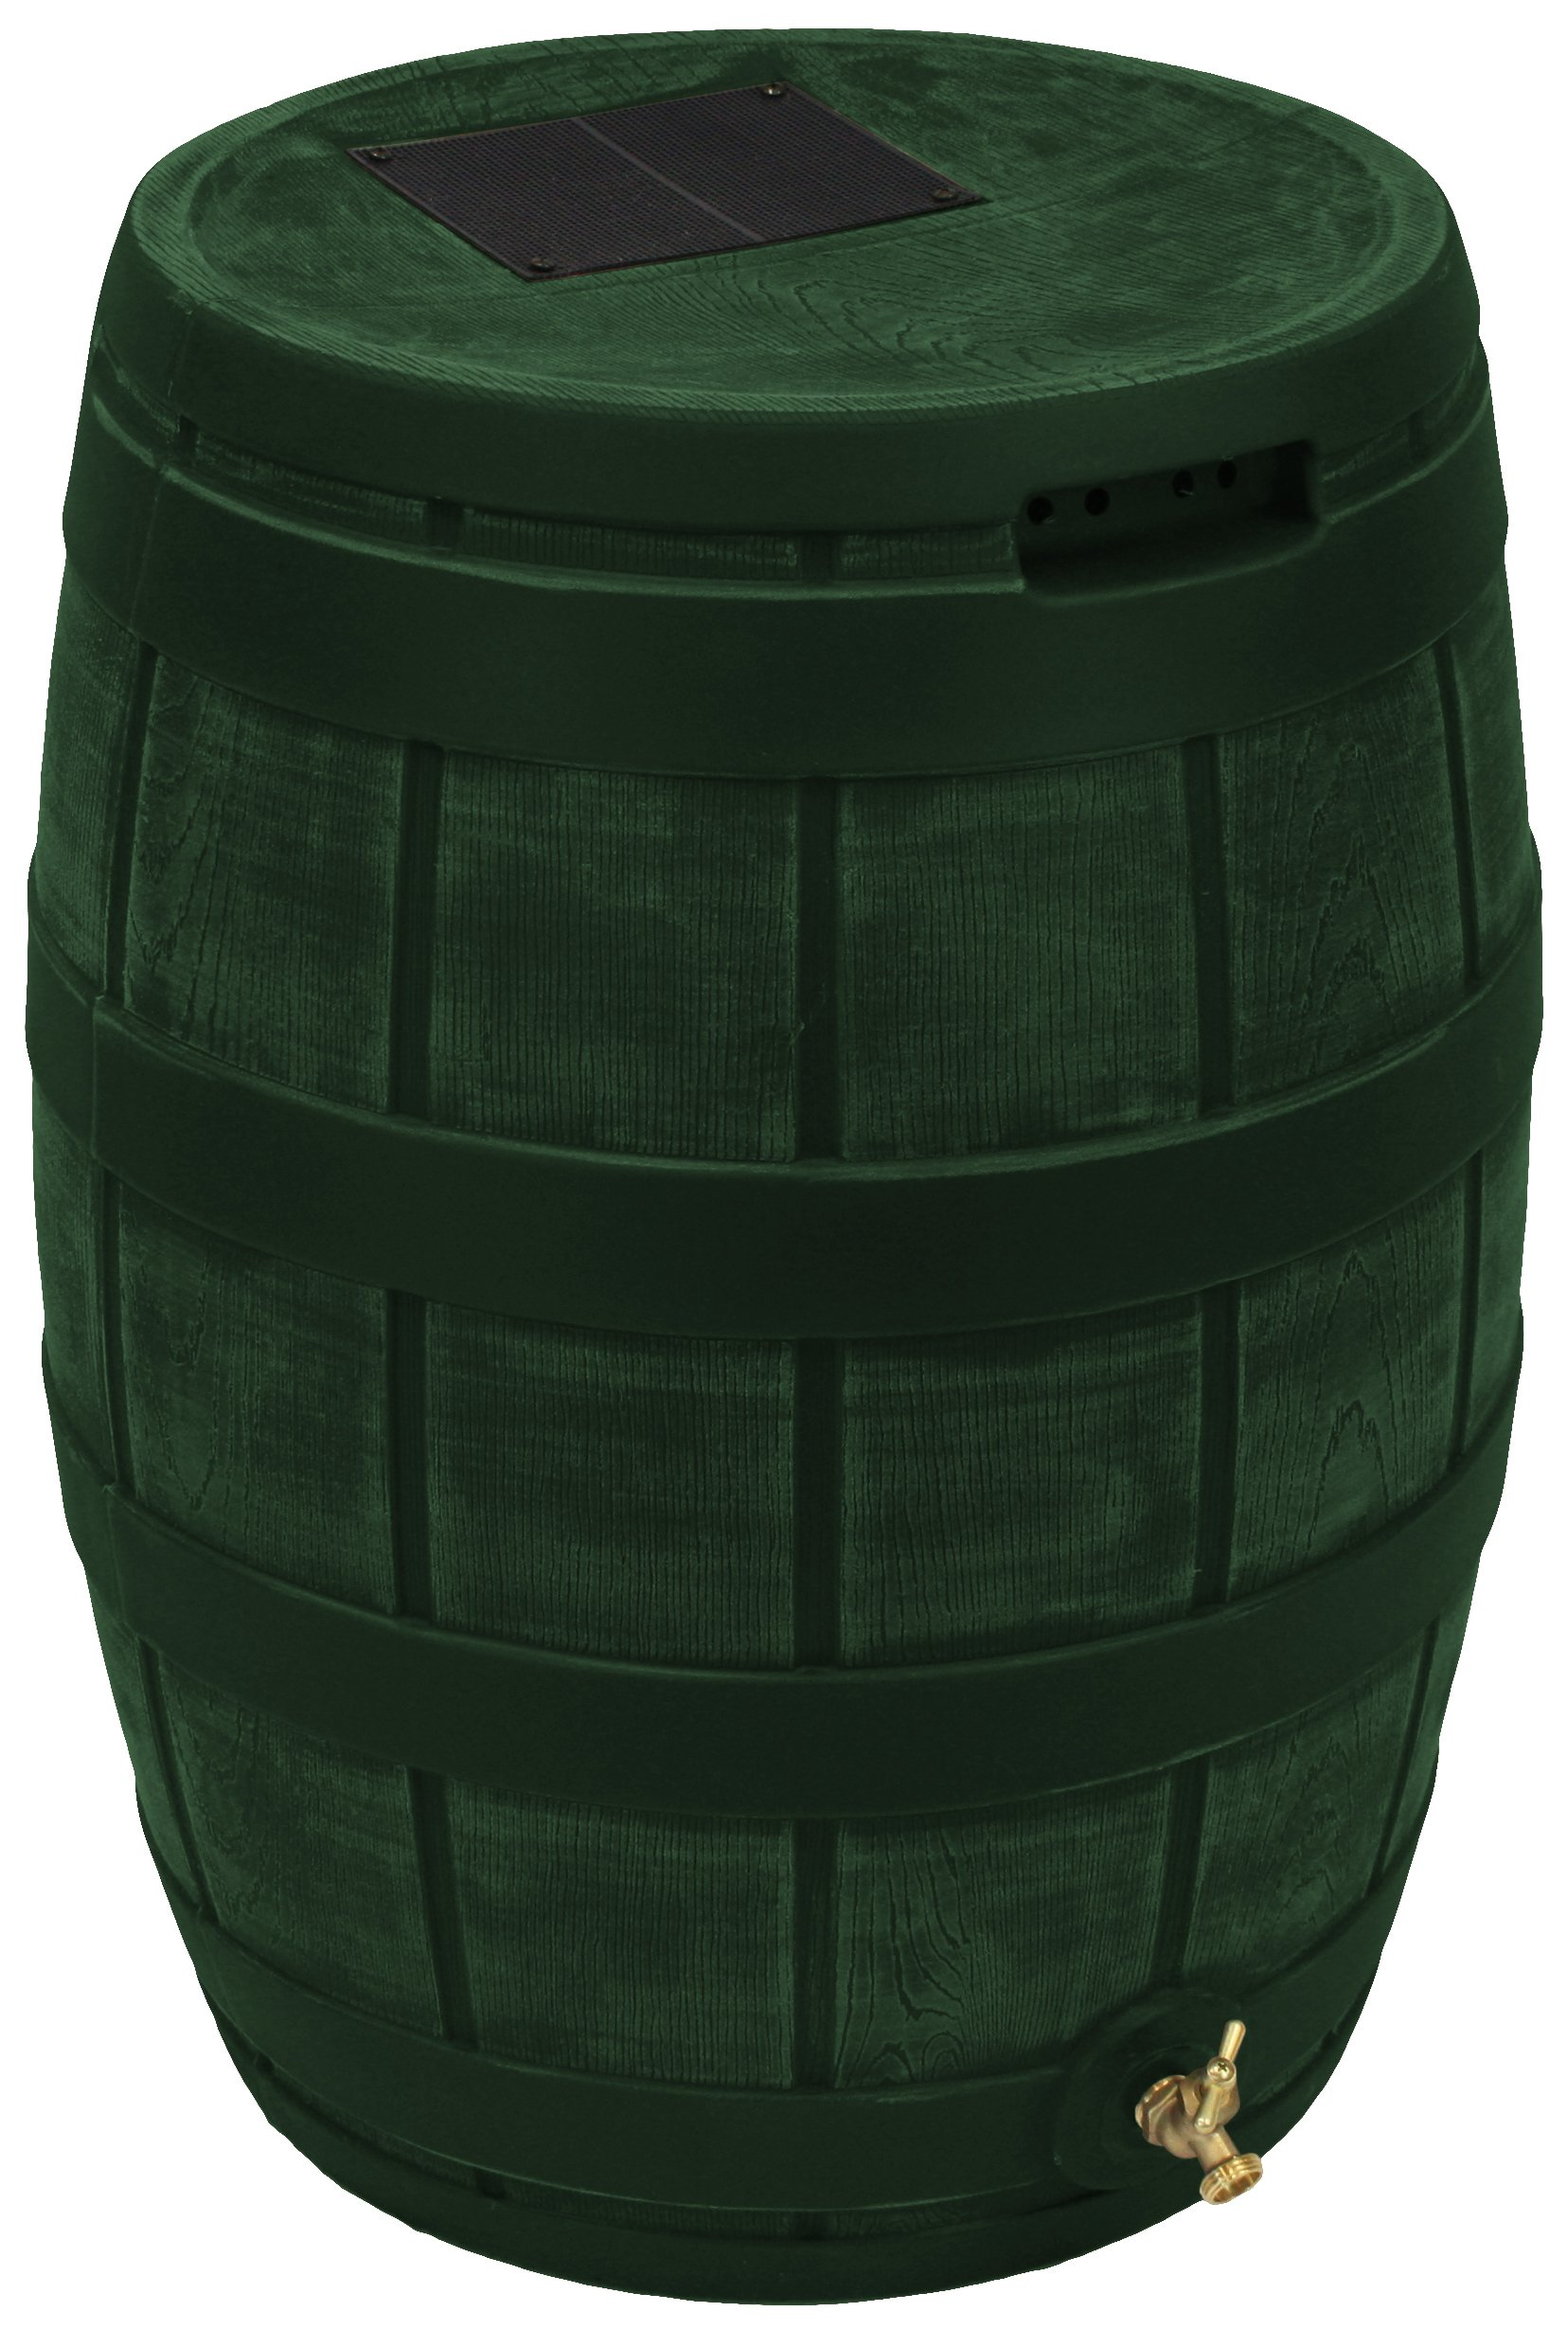 Good Ideas RVT-GRN Rain Vault Rain Barrel, Green